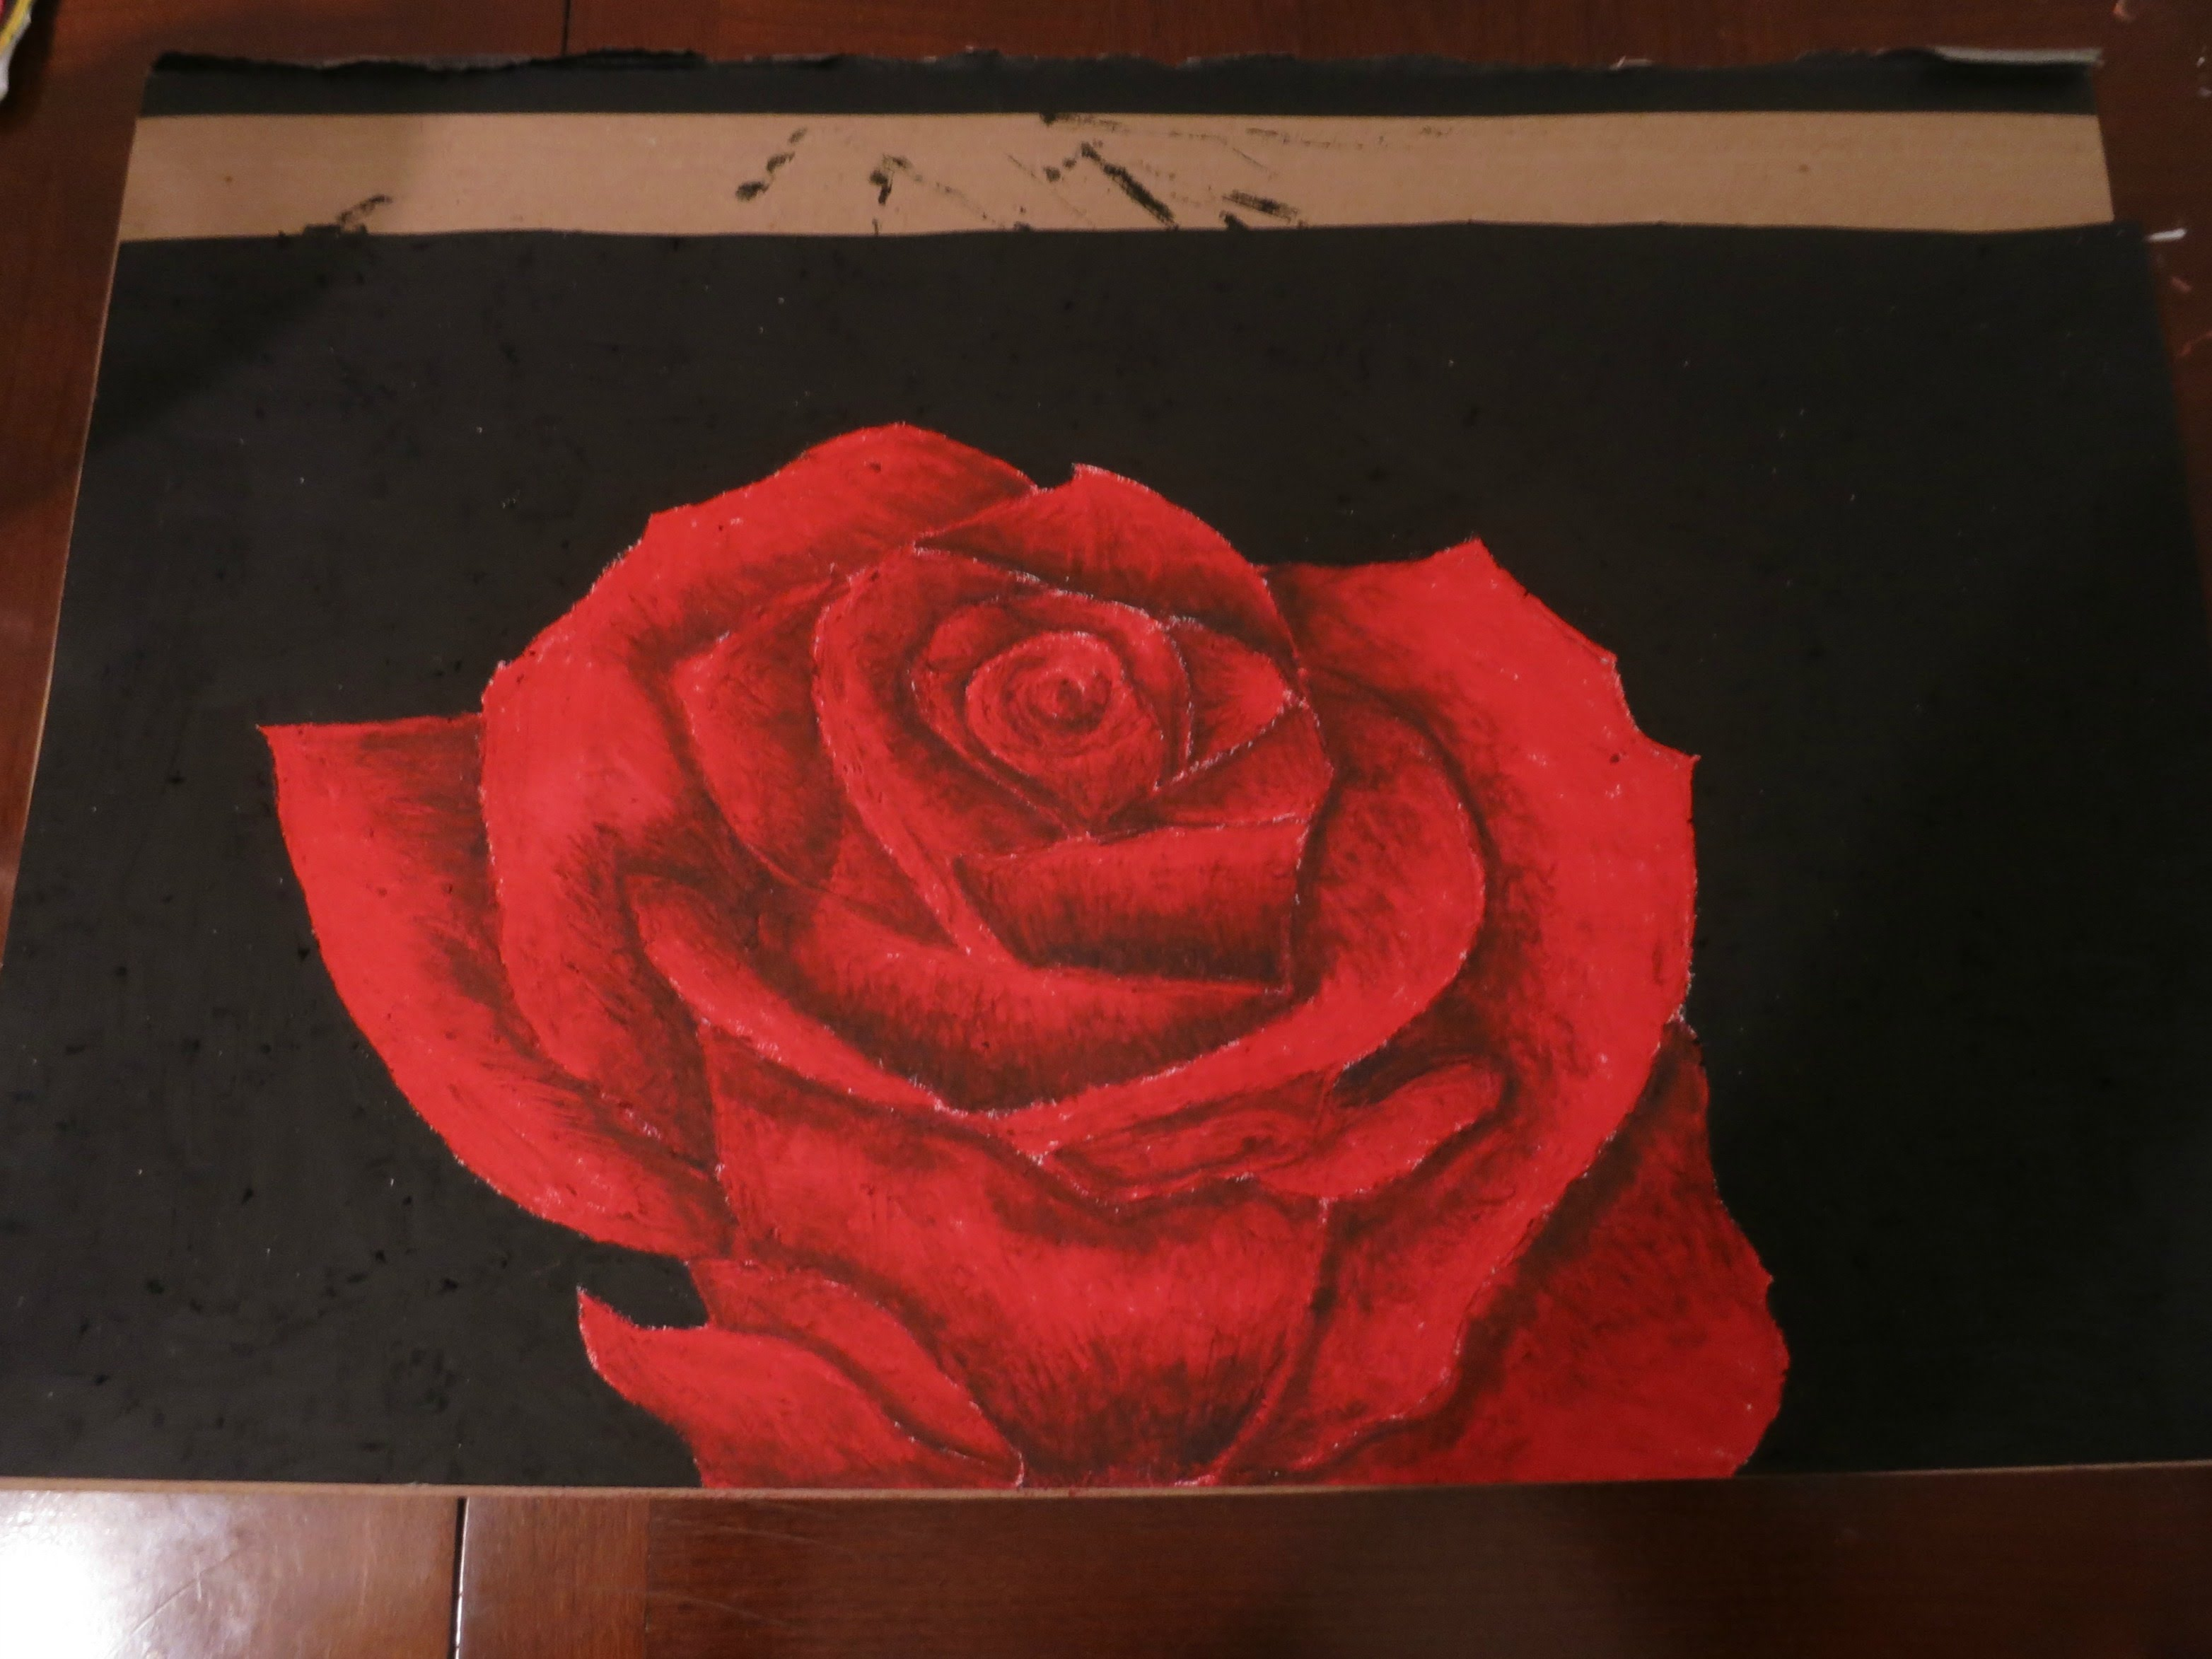 Drawn red rose pastel drawing Rose Oil Oil YouTube Pastel